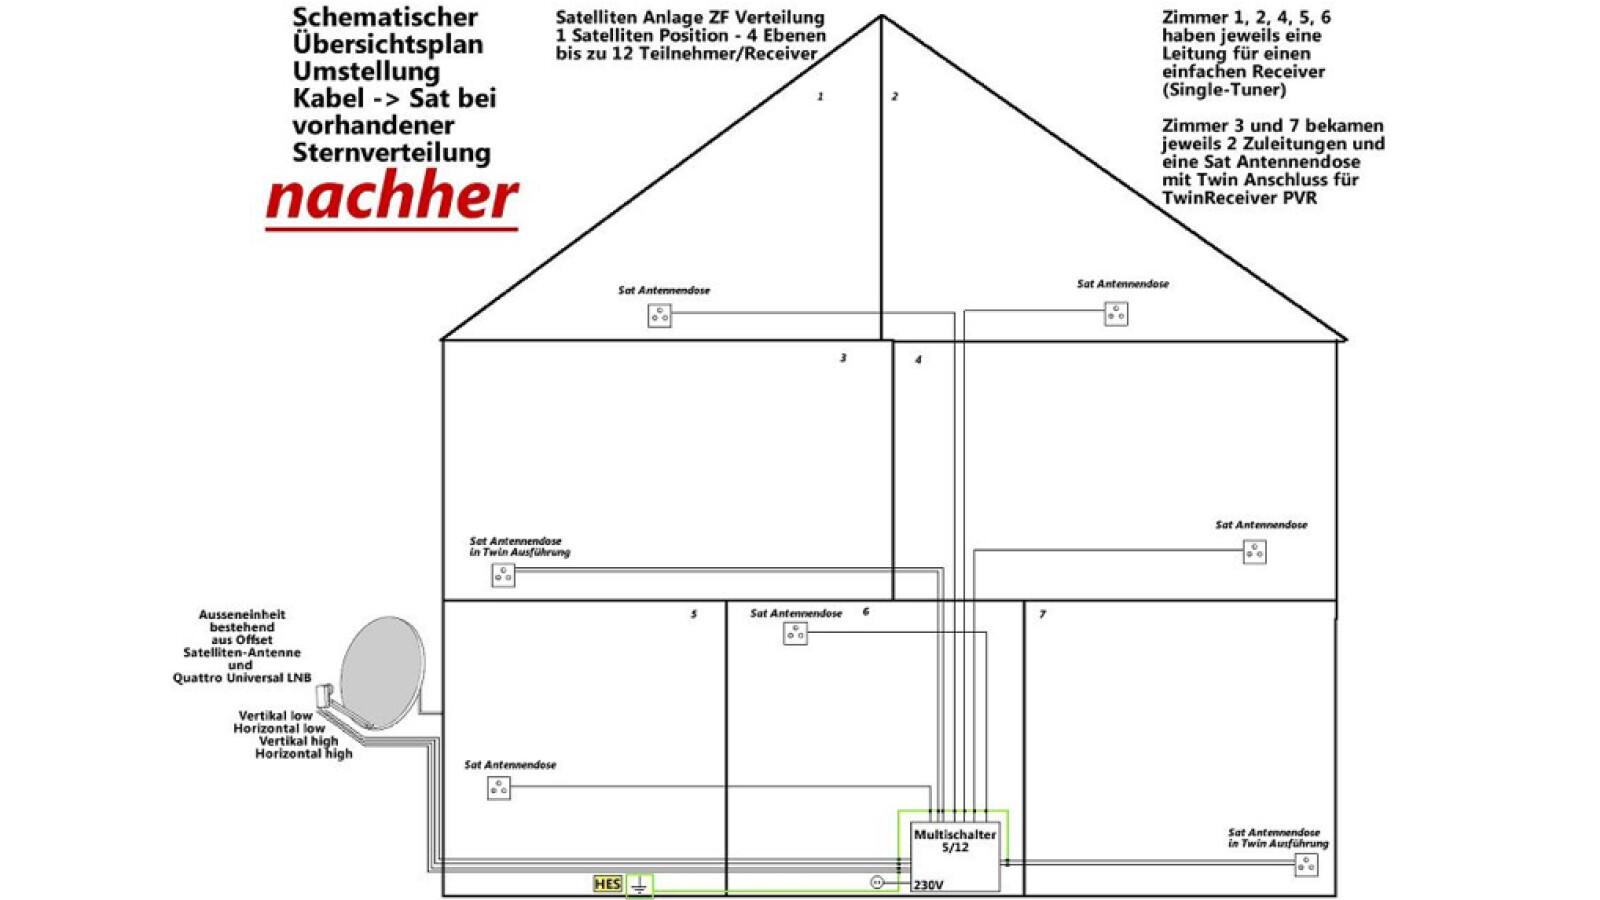 sat technik unicable verkabelung so geht 39 s netzwelt. Black Bedroom Furniture Sets. Home Design Ideas